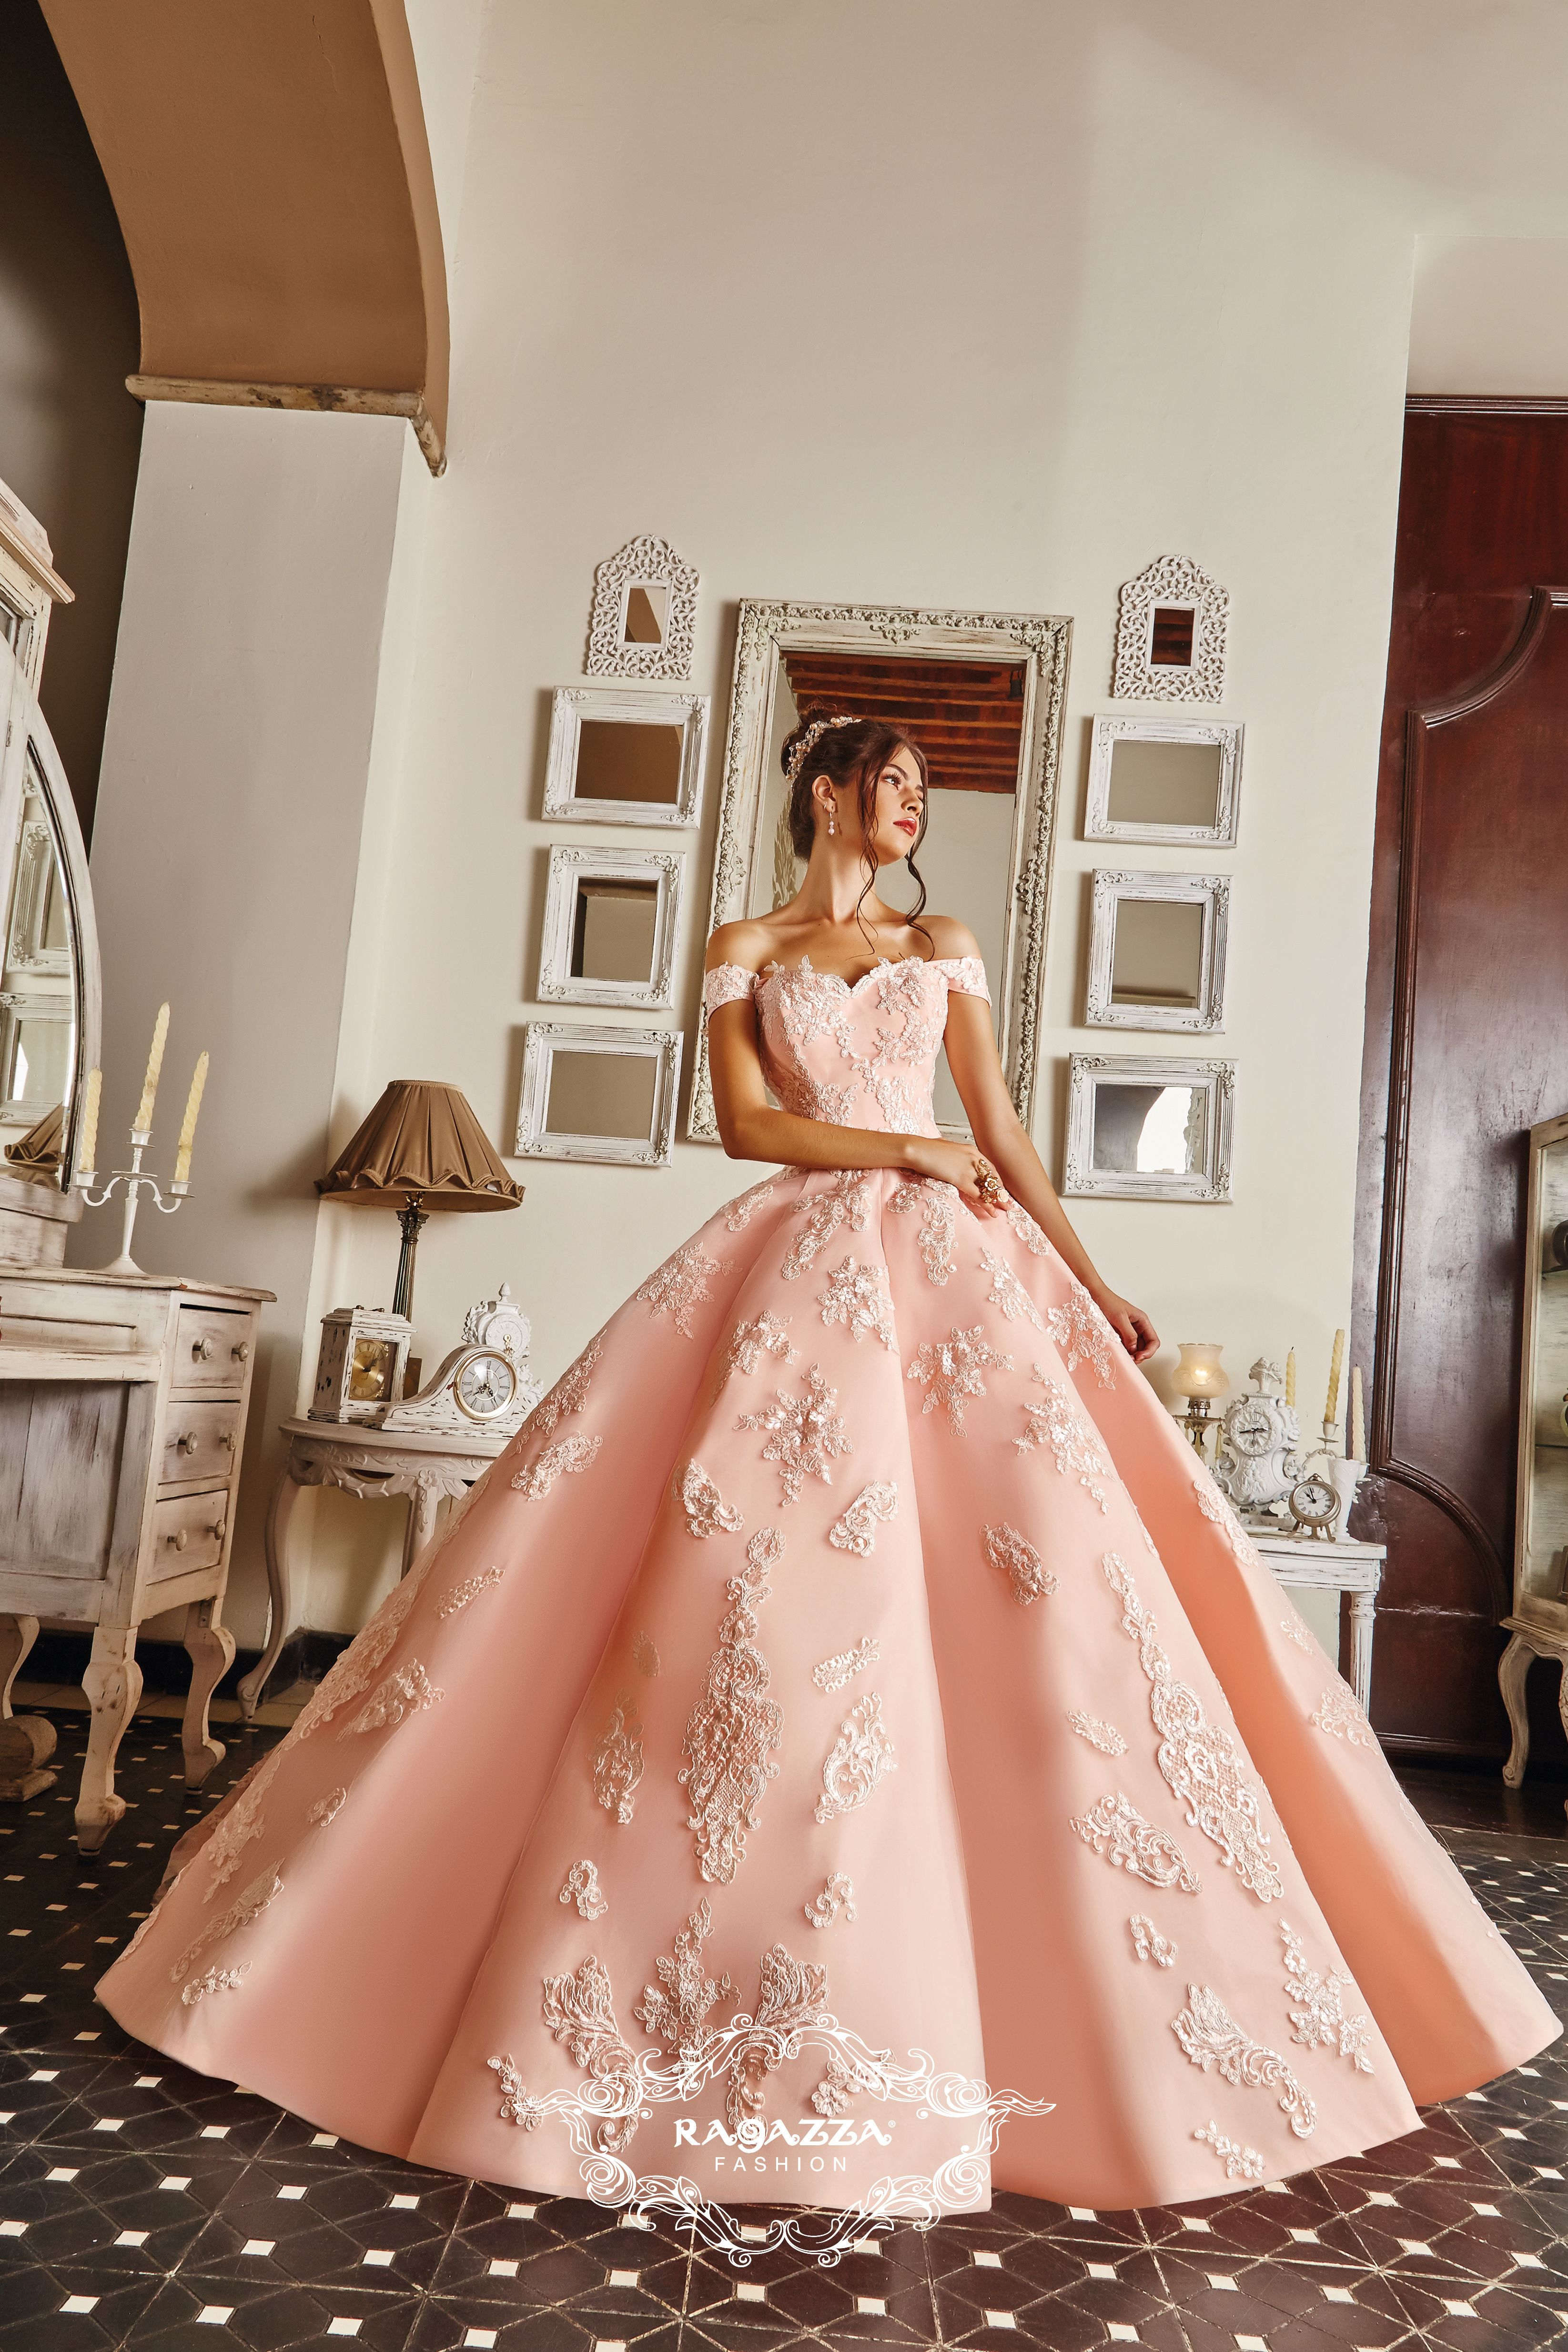 Pin By Sara Caroline On Pastelitos Quince Dresses Quincenera Dresses Quinceanera Dresses Pink [ 4937 x 3291 Pixel ]